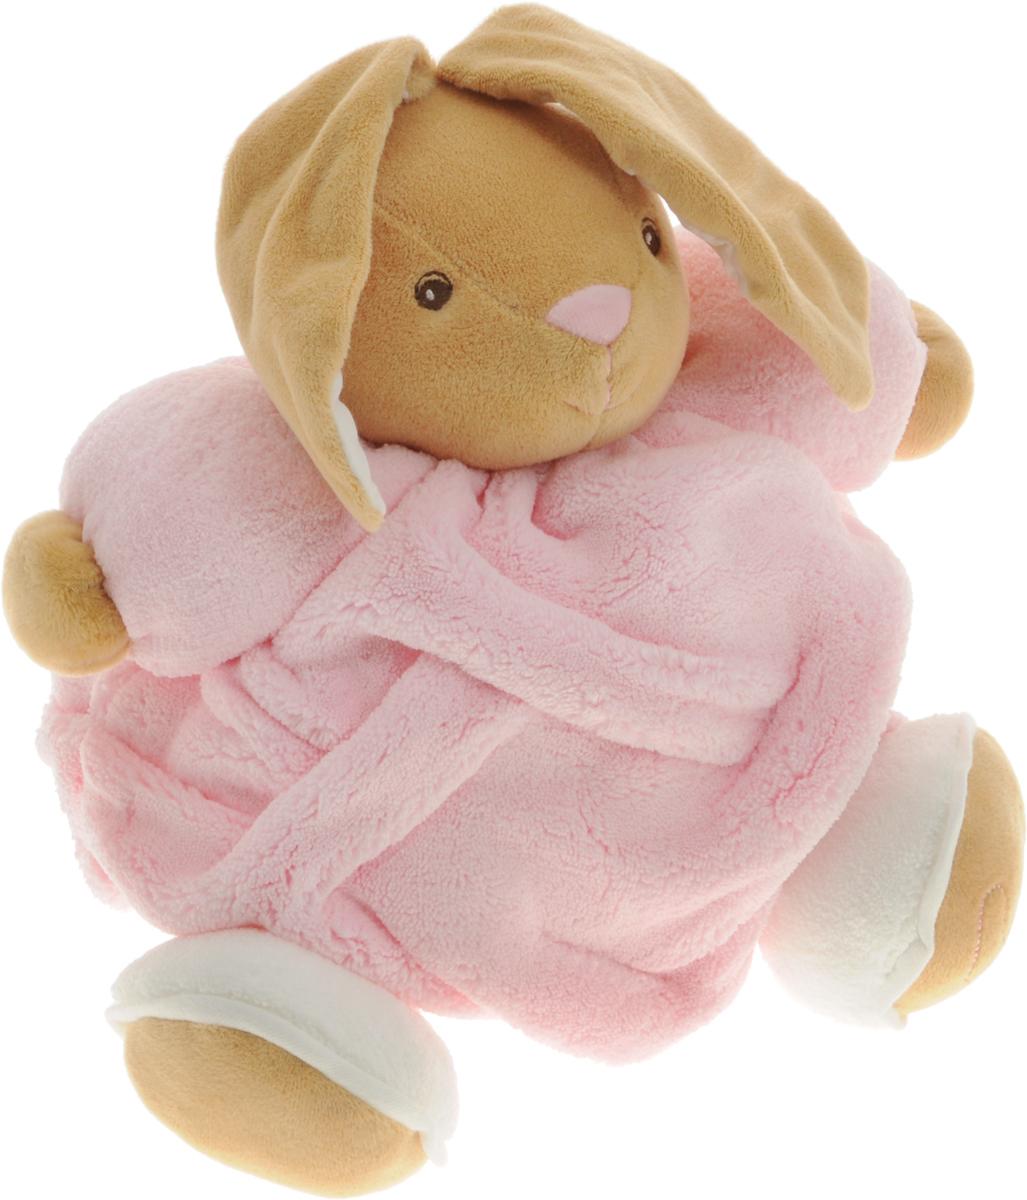 Kaloo Мягкая игрушка Заяц цвет светло-розовый 18 см